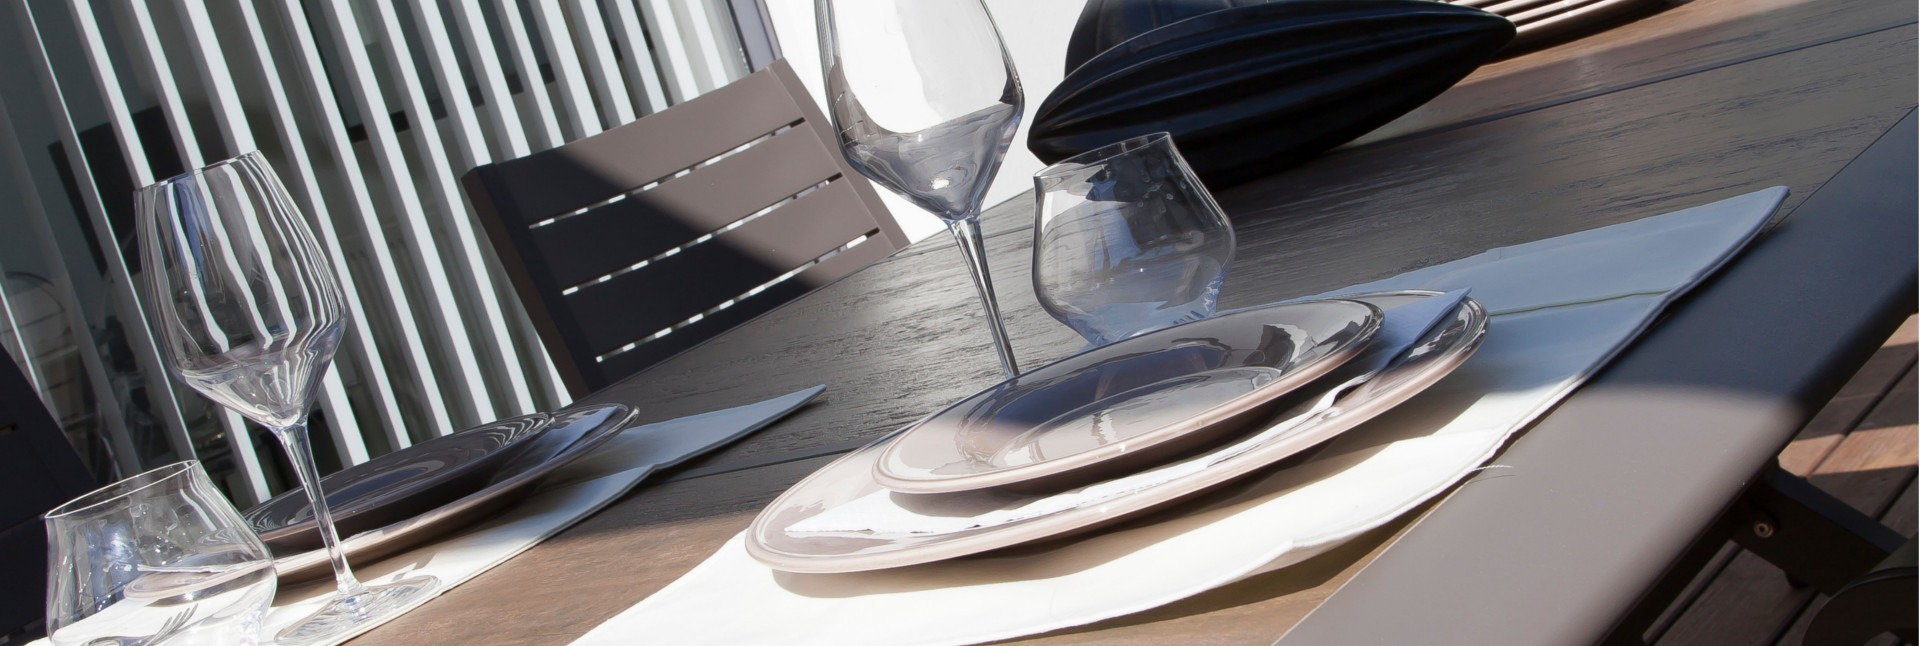 Table Céram zoom plateau